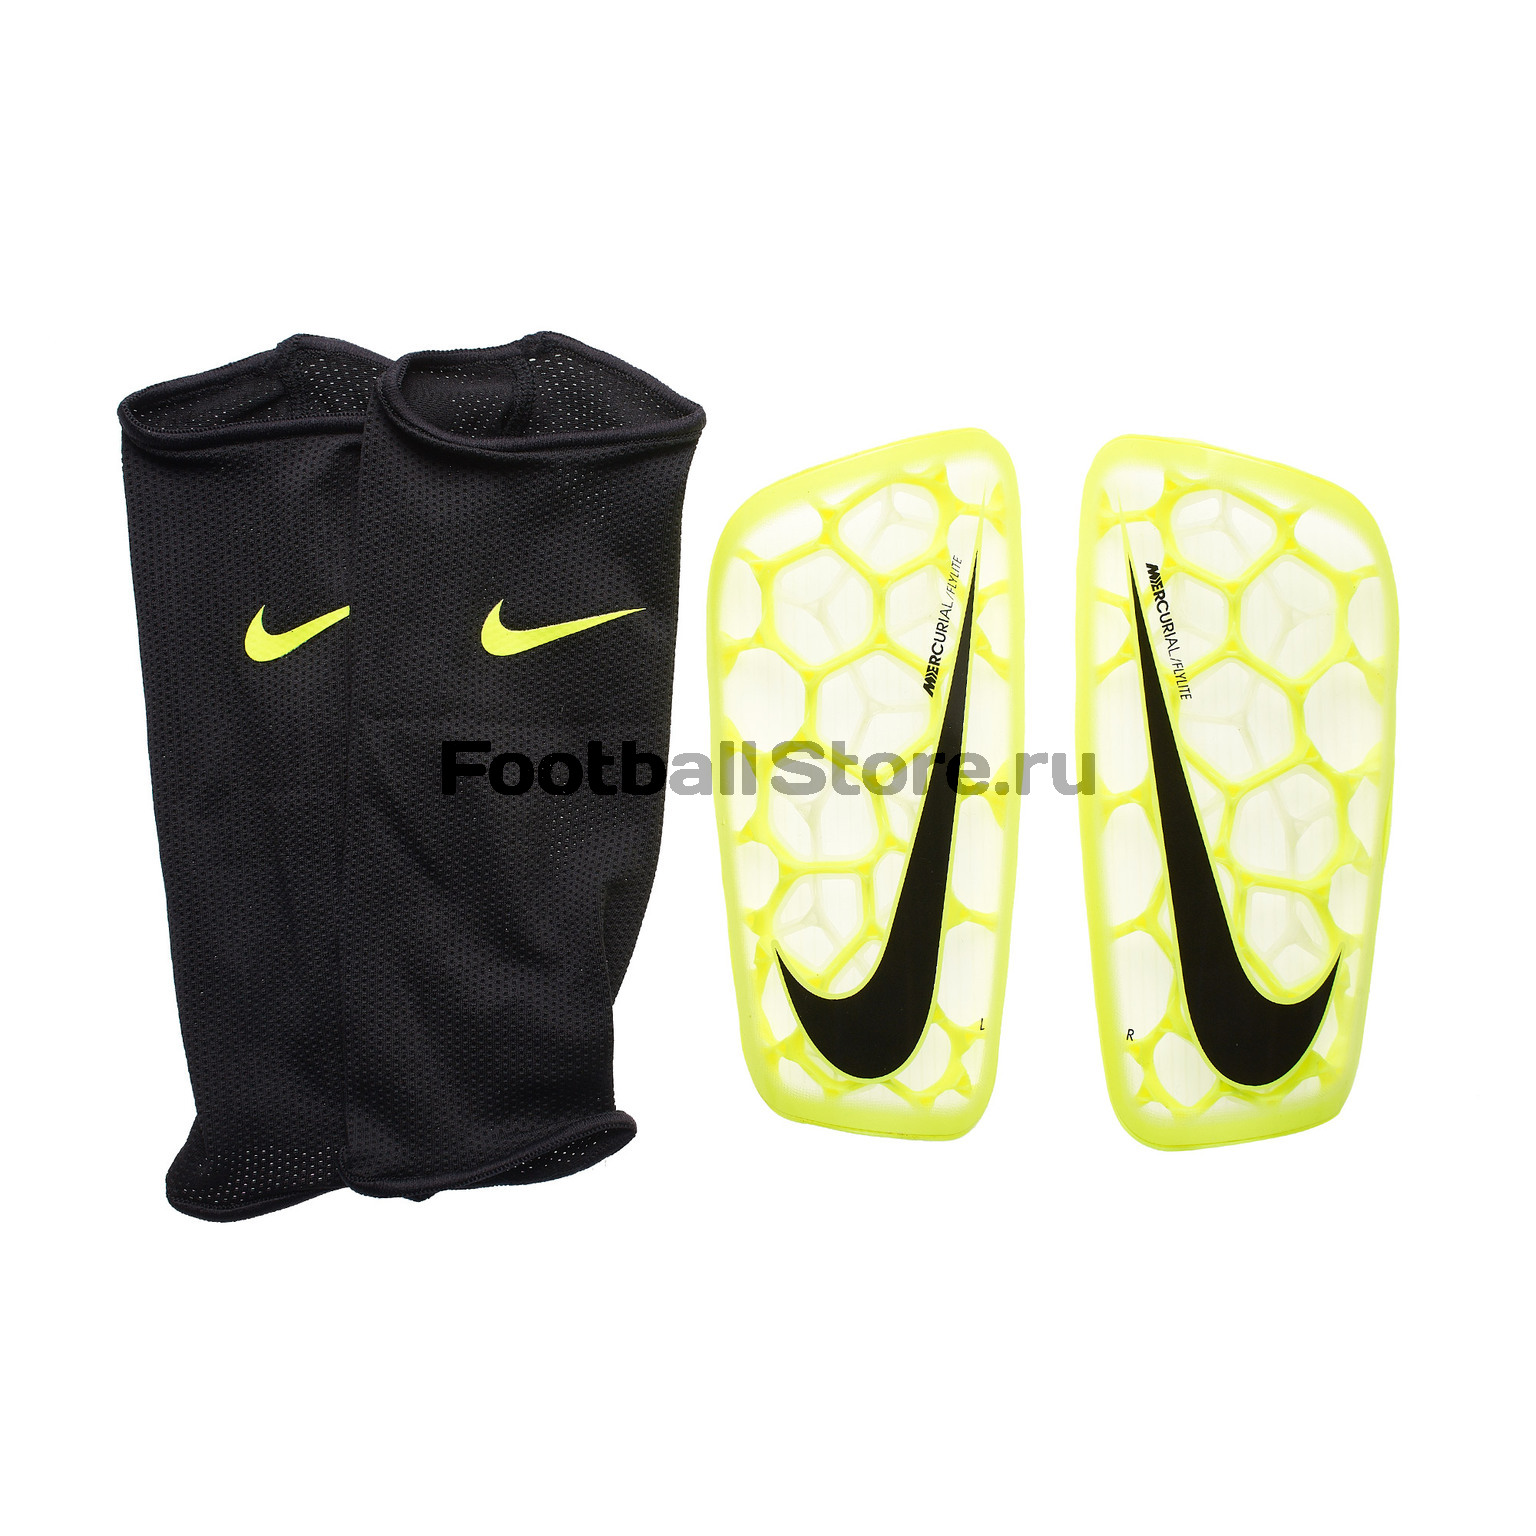 Щитки Nike Mercurial Flylite GRD SP2121-702 щитки nike mercurial lite superlock sp2163 702